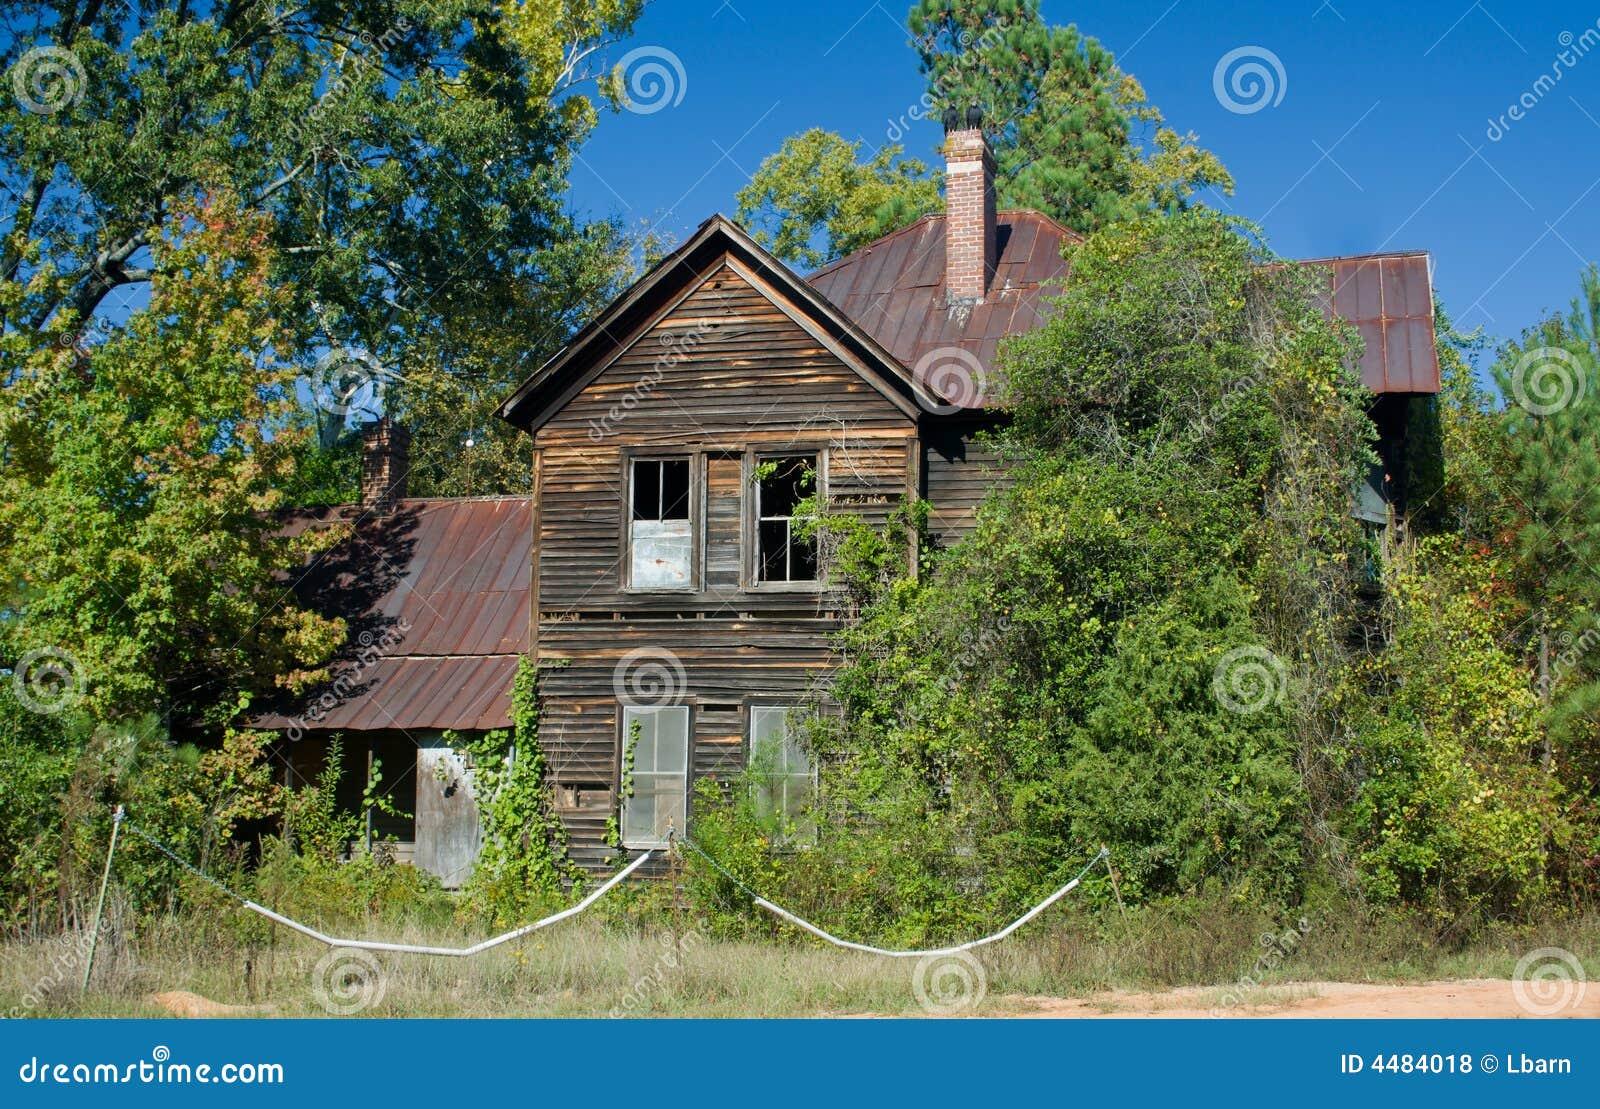 Griezelig oud huis stock foto afbeelding bestaande uit roestig 4484018 - Huis verlenging oud huis ...